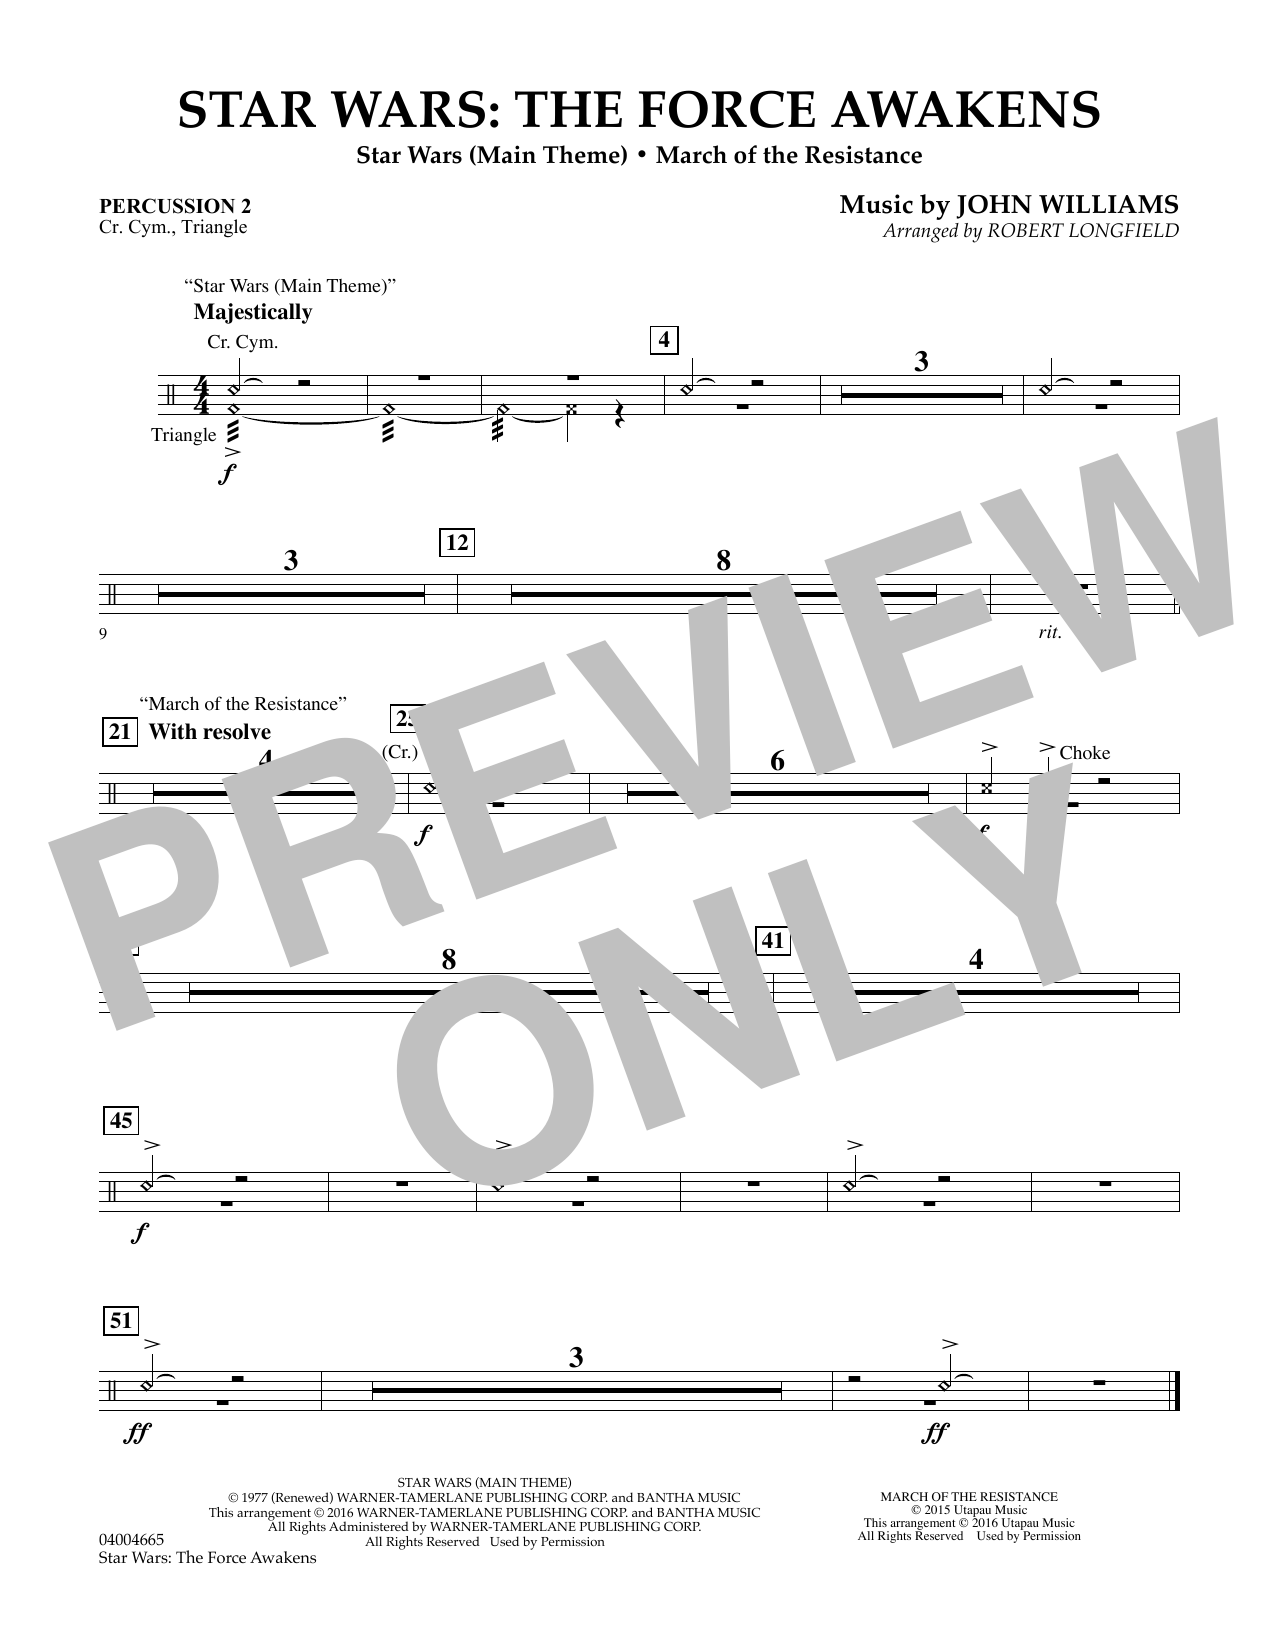 John Williams - Star Wars: The Force Awakens - Percussion 2